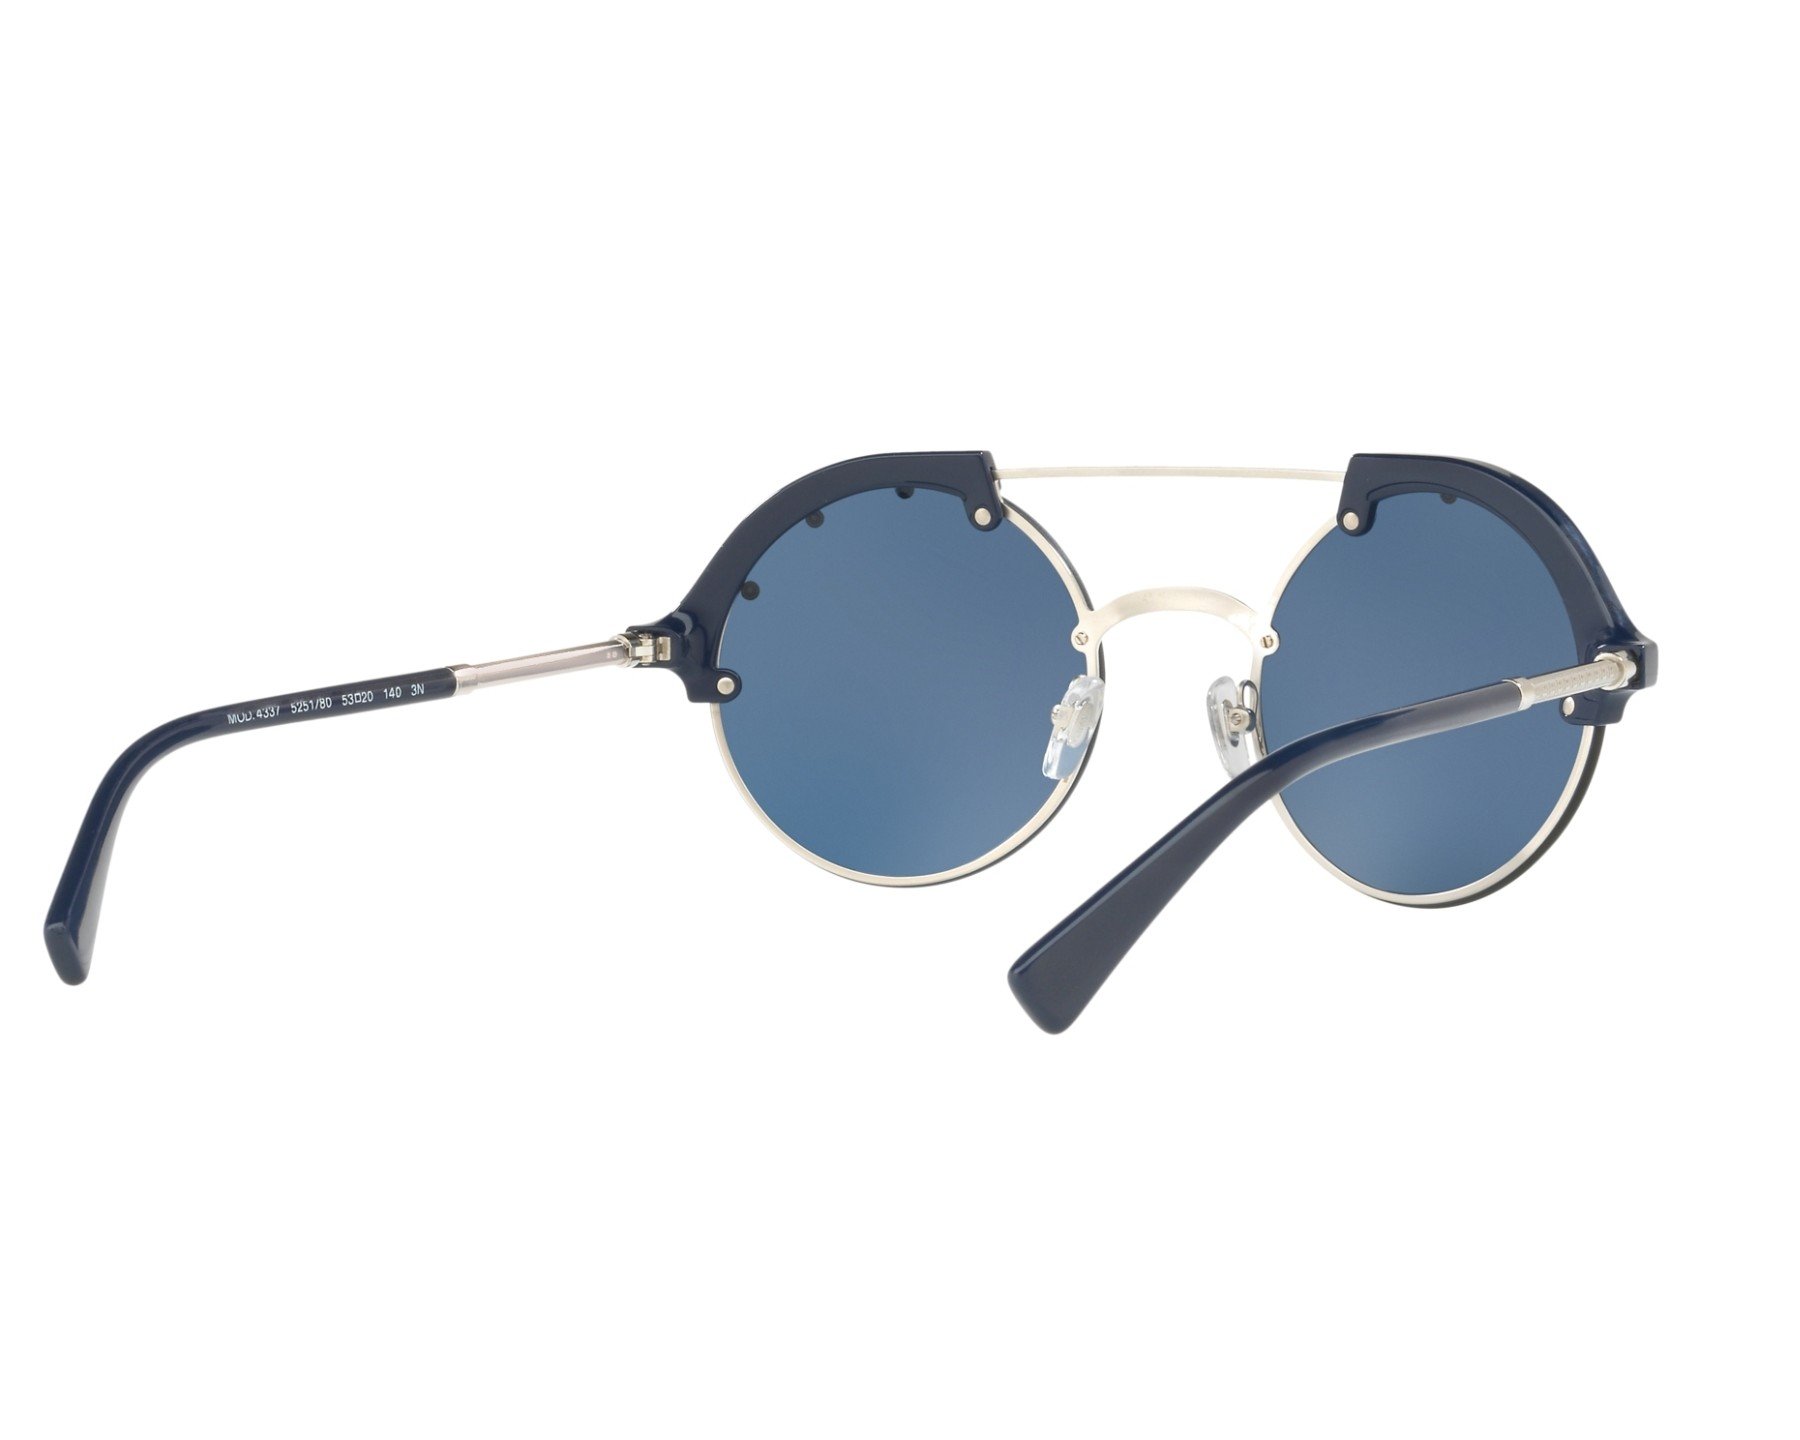 df879c40e0 Sunglasses Versace VE-4337 525180 53-20 Blue Silver 360 degree view 8